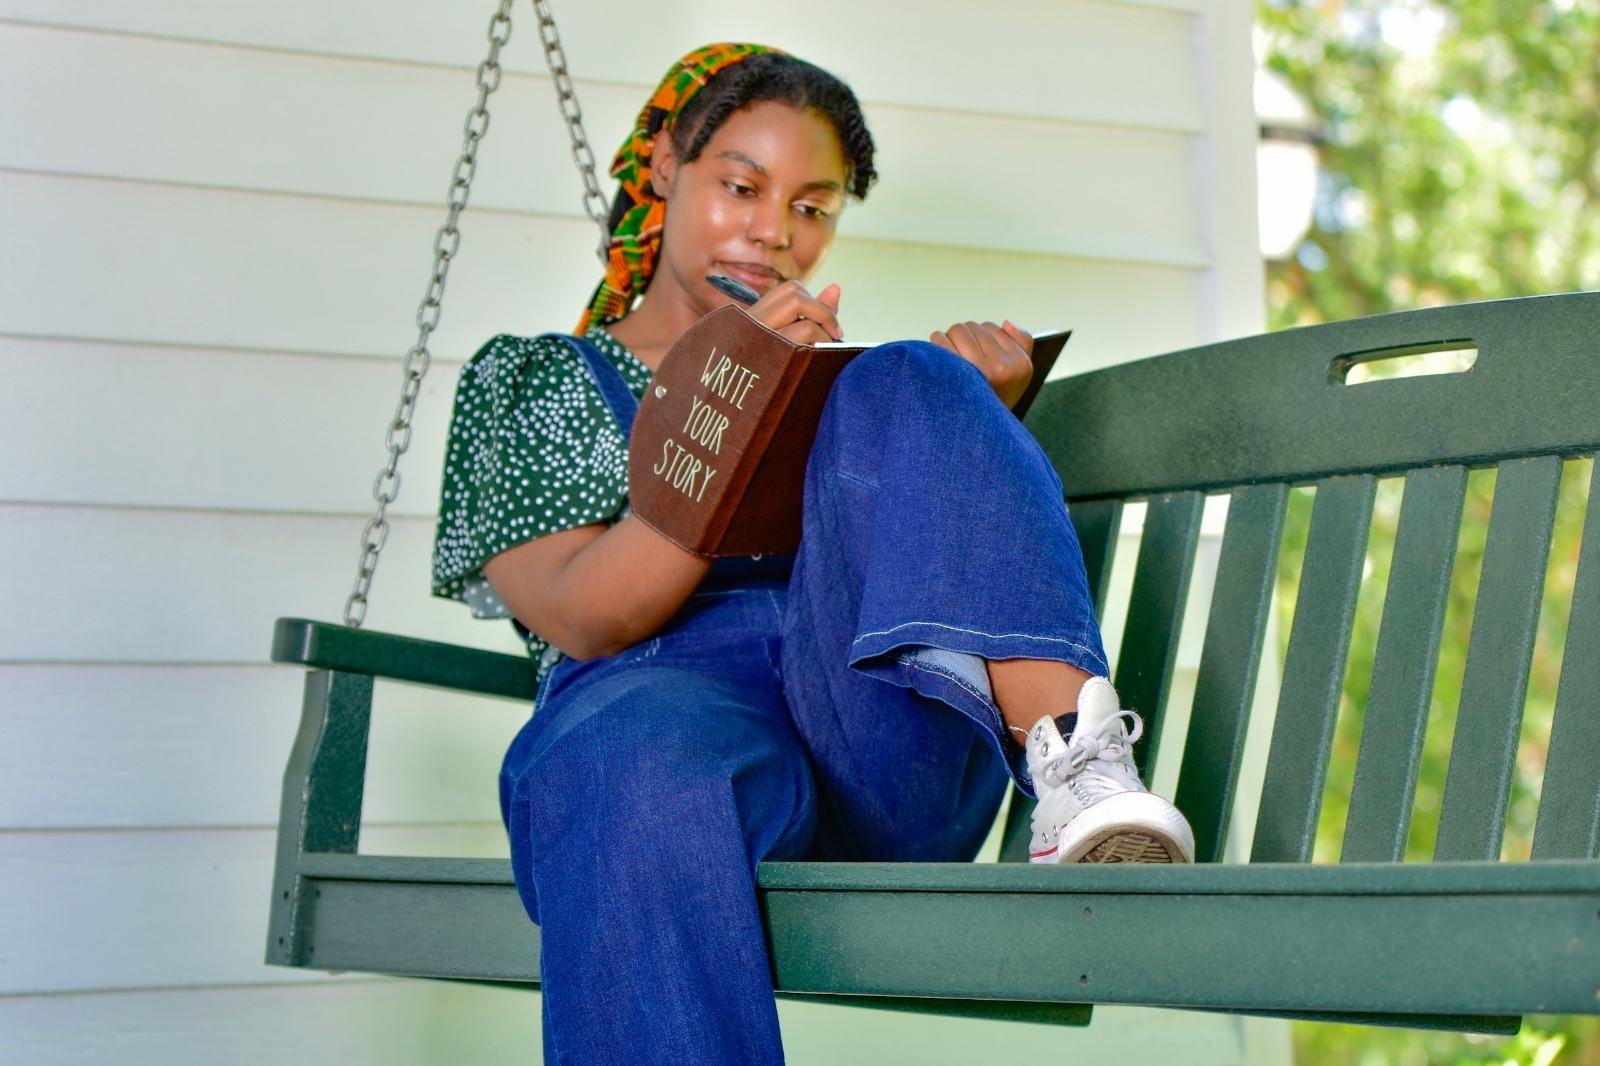 Jonesha Johnson writes in her journal. Photo credit: Kevin Dantes courtesy of Black Farmers' Network